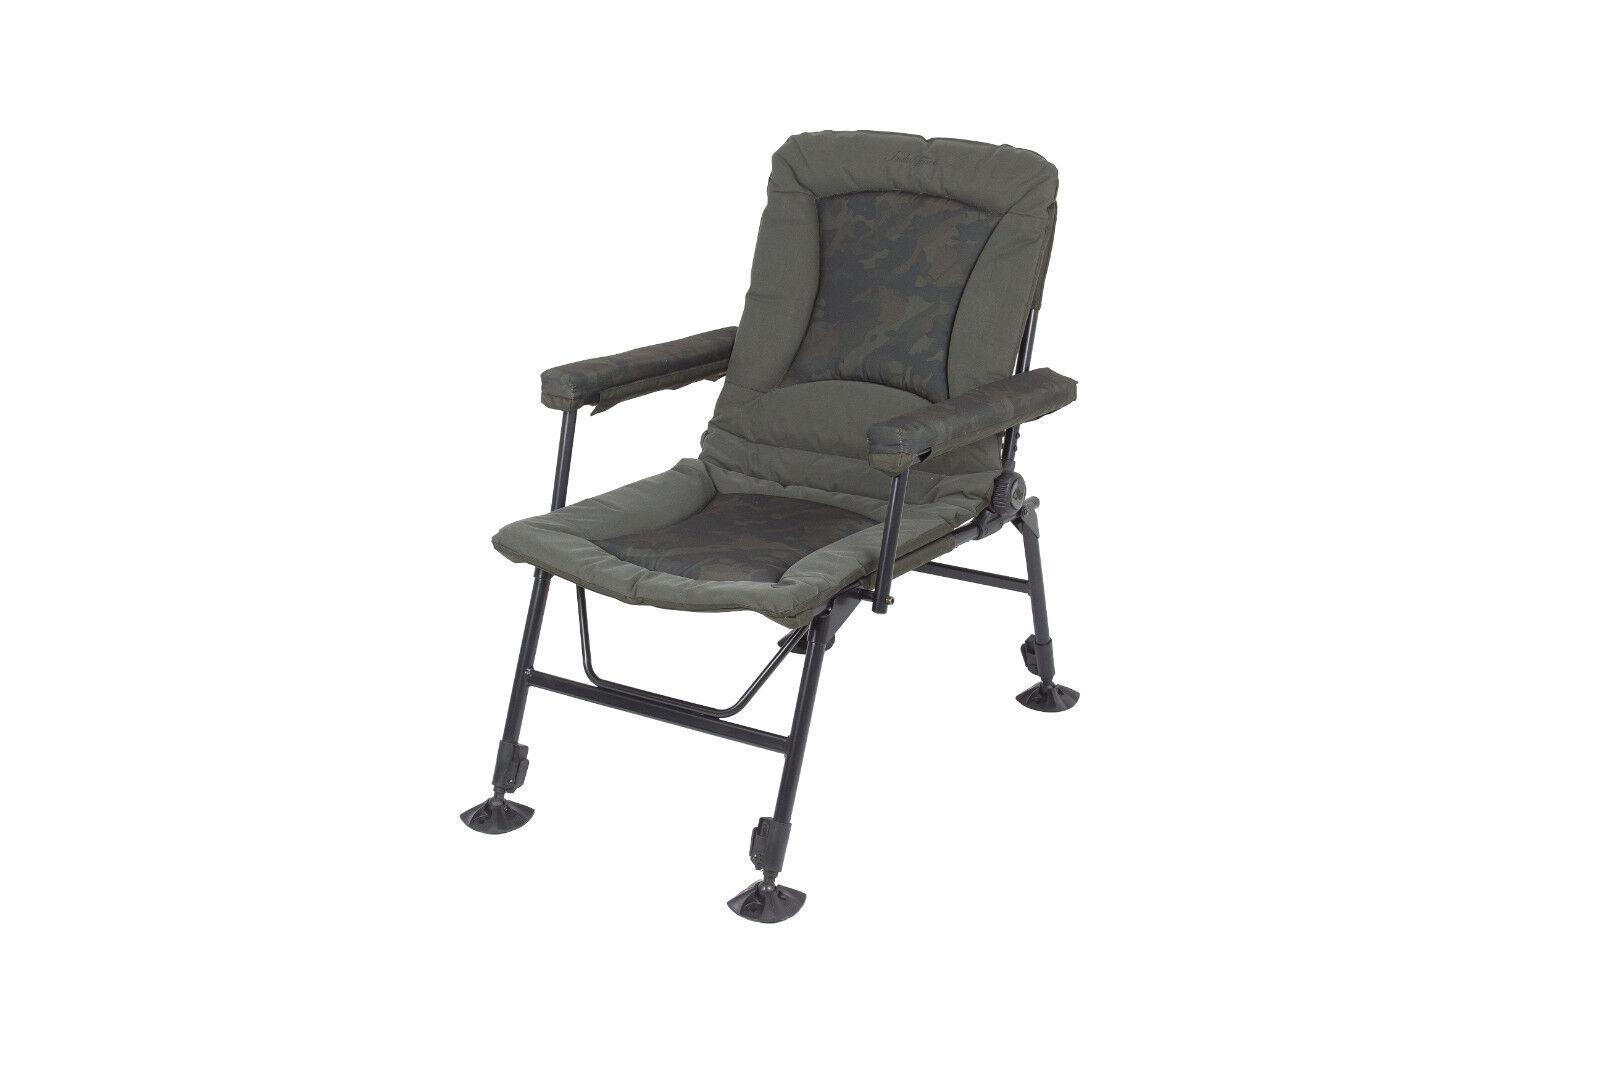 Nash Indulgence Daddy Long Legs camo Chair t9751 karpfenstuhl angel silla